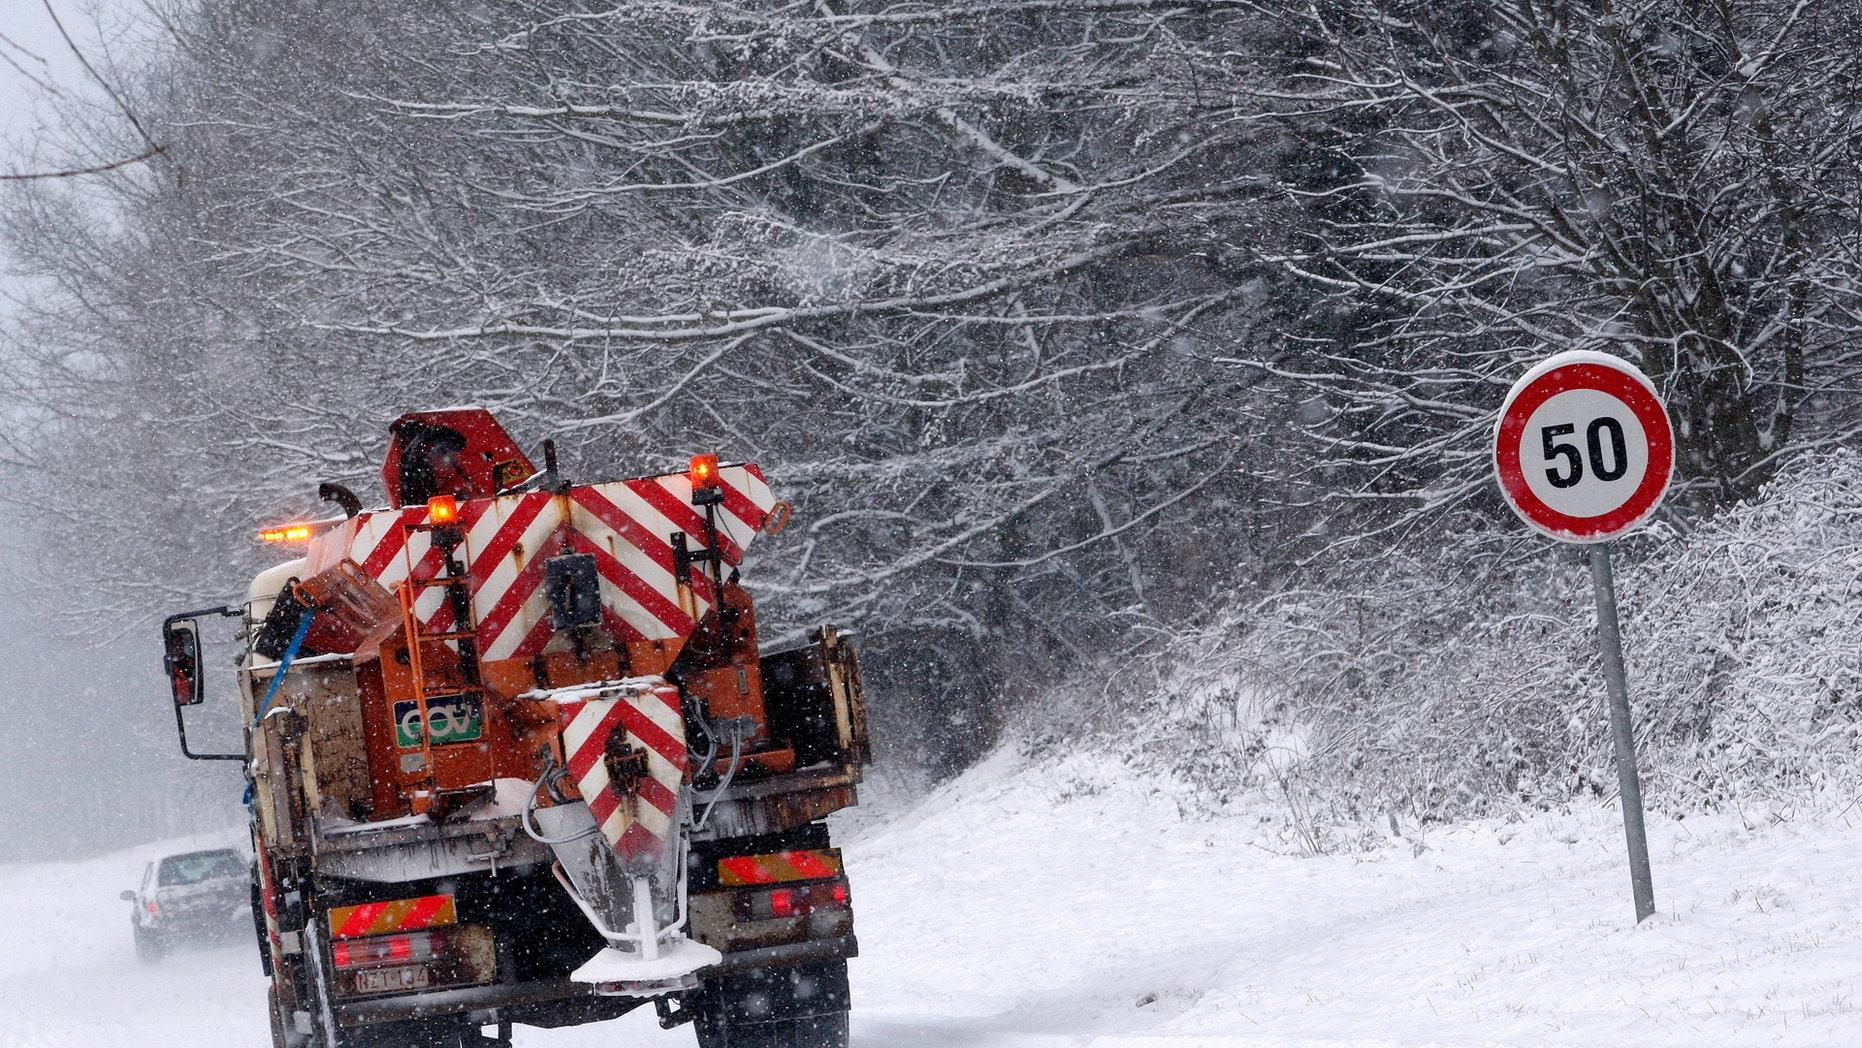 File photo: A truck spreads salt on a road in Sterrebeek February 10, 2010. (REUTERS/Sebastien Pirlet)